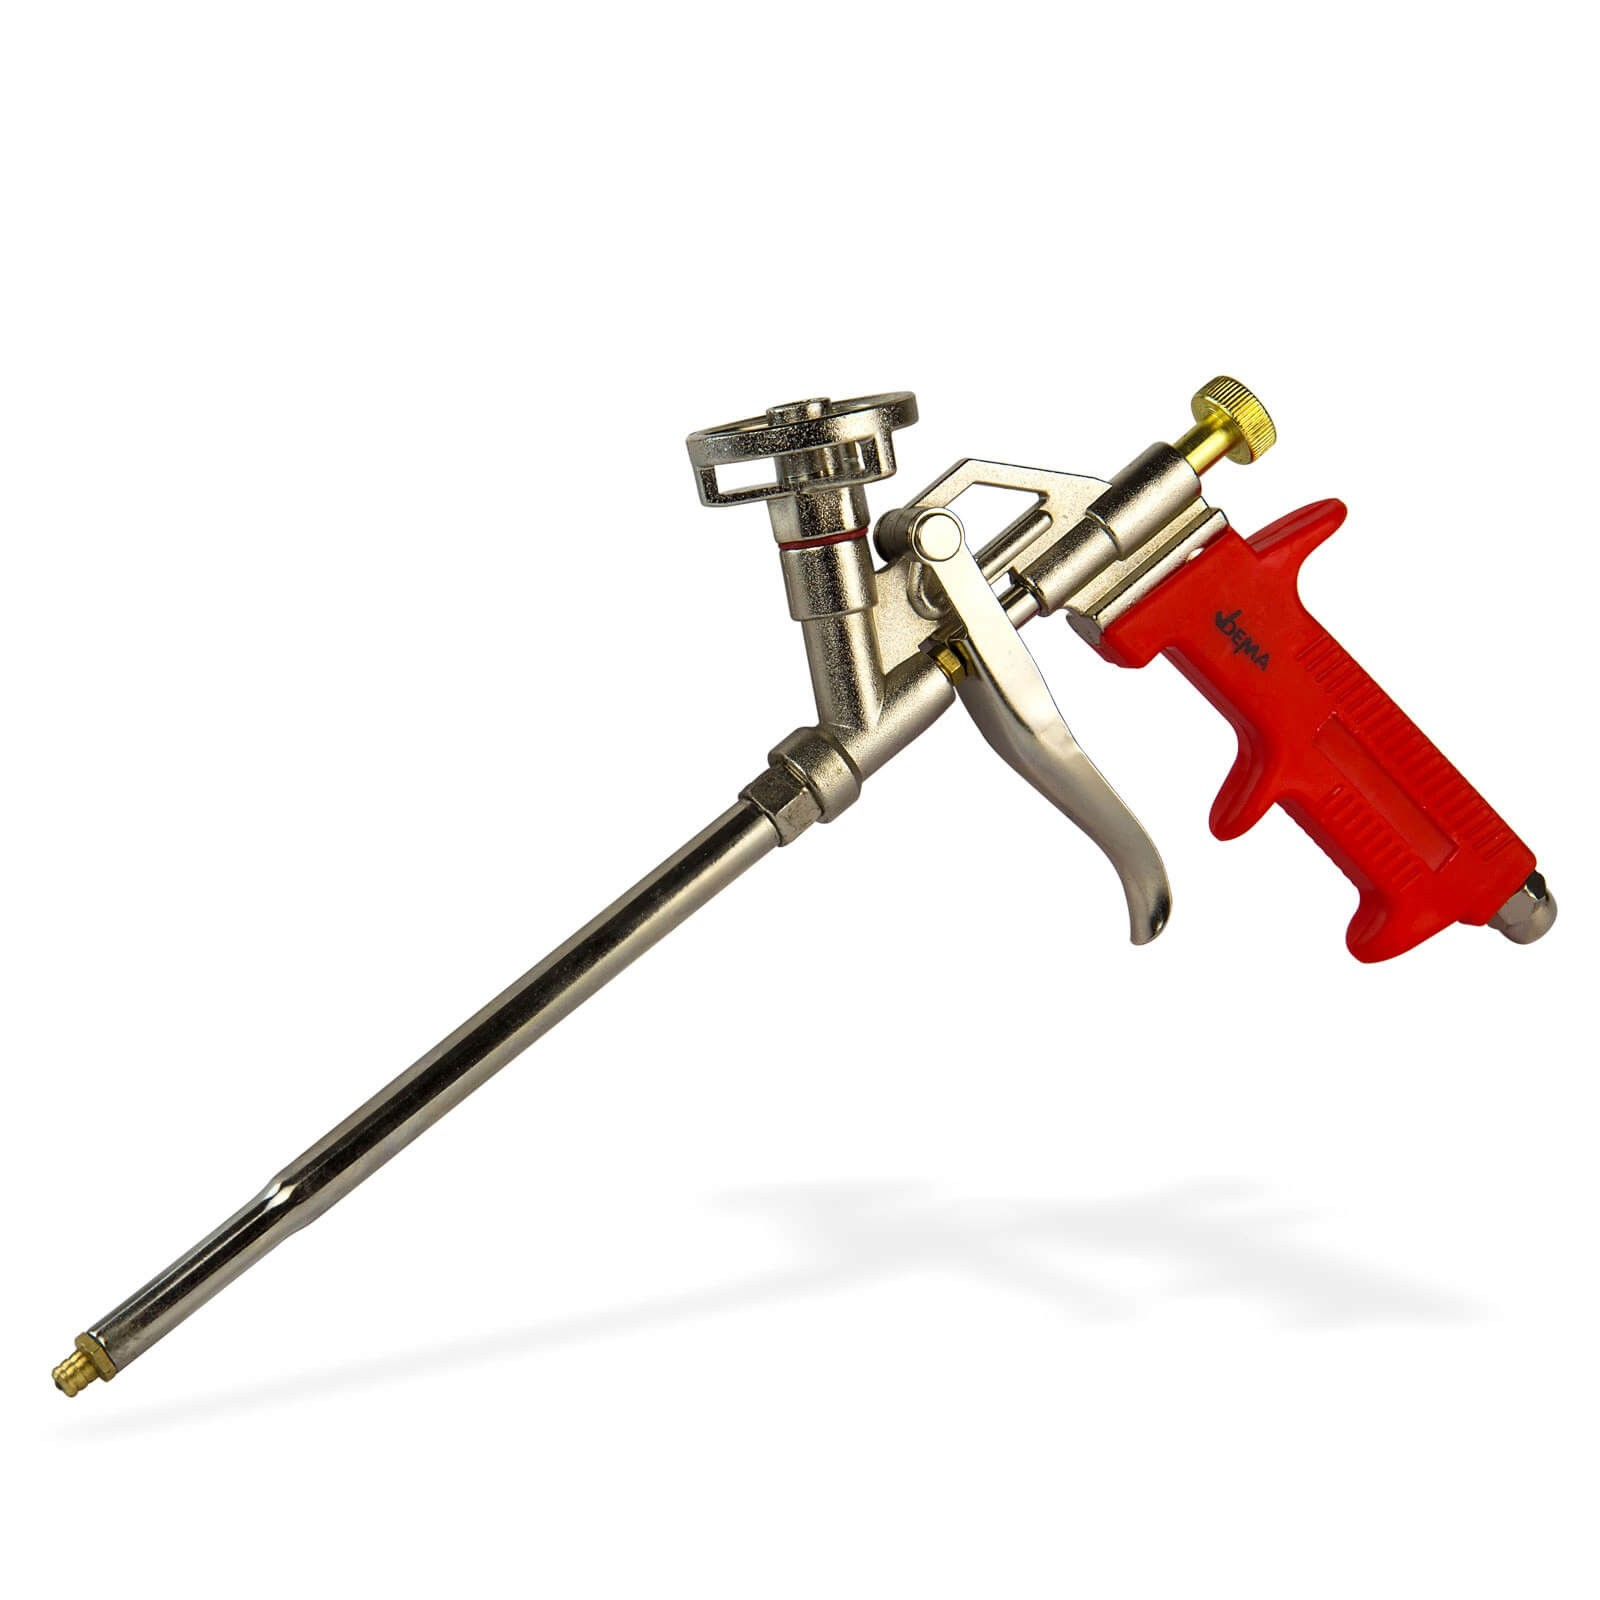 Dema PU Schaumpistole DSP Pistole Bauschaum Pistolenschaum 15230